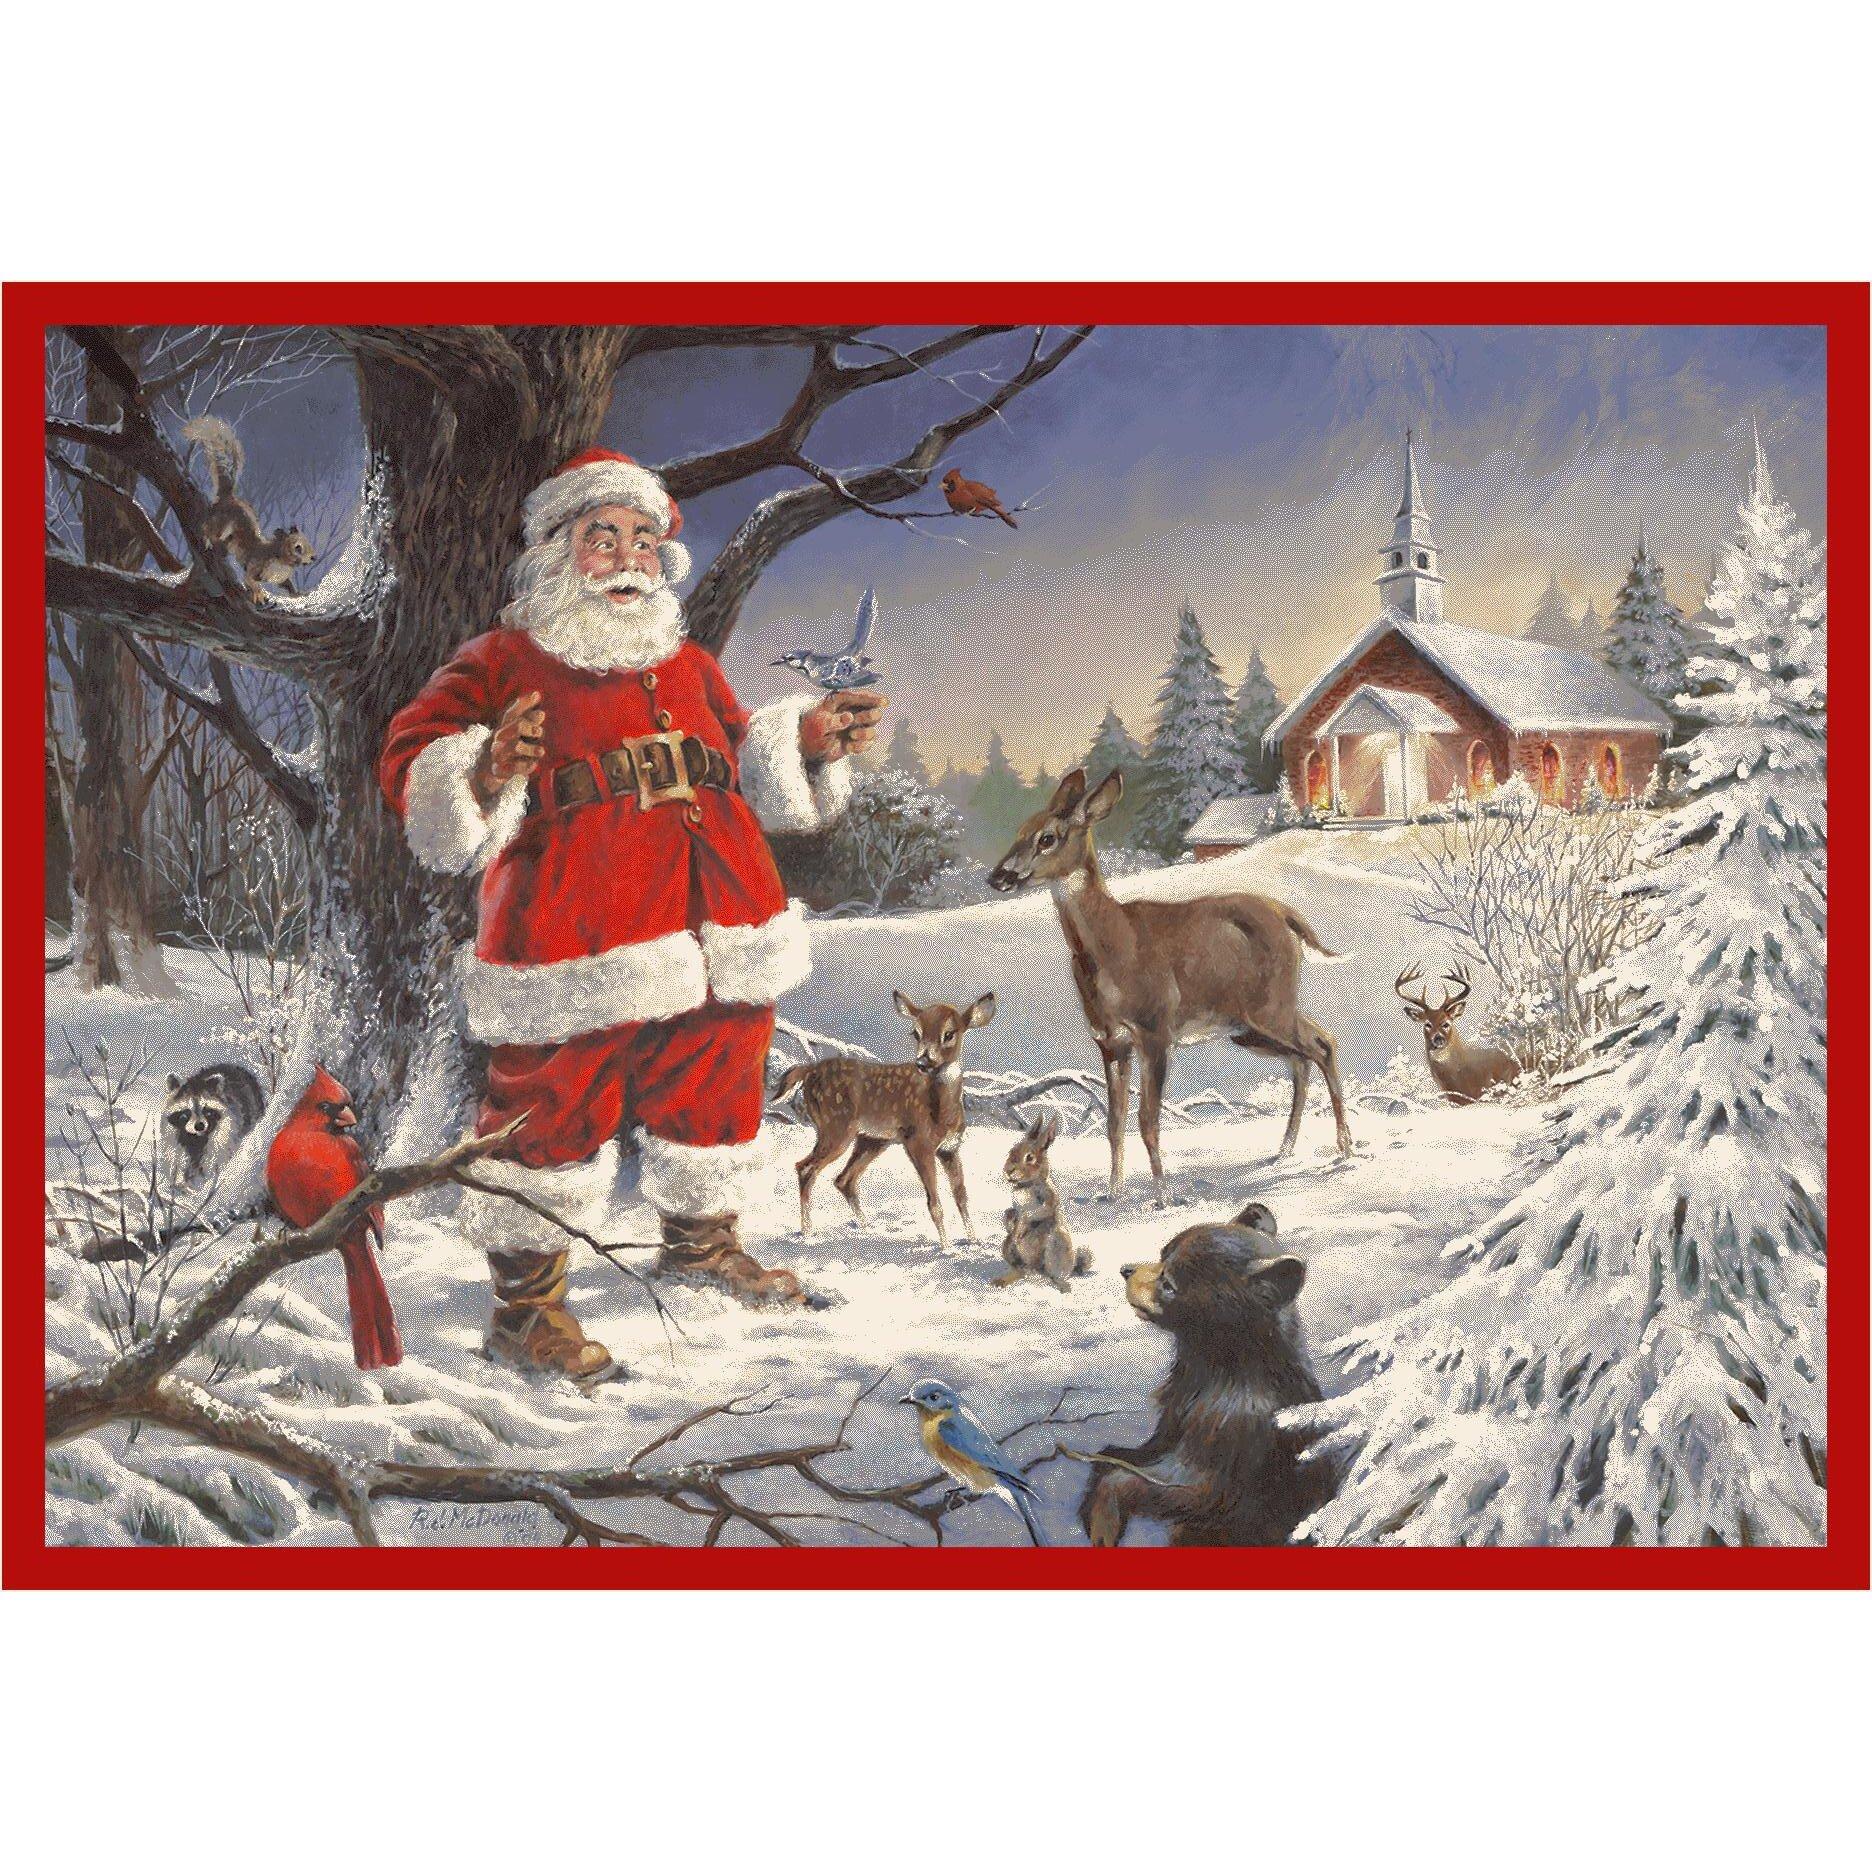 Foyer Rugs For Christmas: Milliken RJ McDonald Christmas Party Area Rug & Reviews